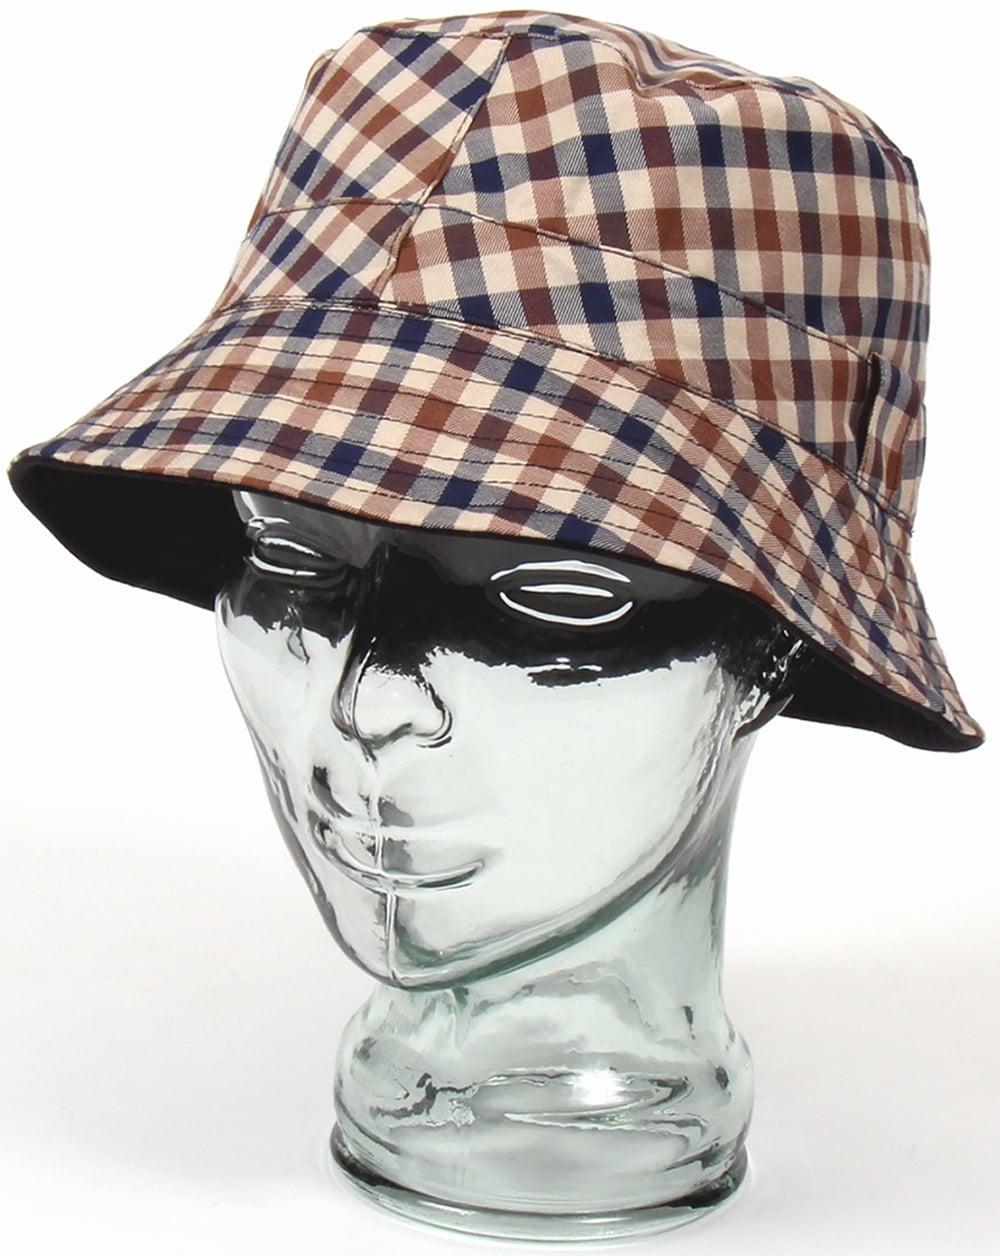 Aquascutum Club Check Bucket Hat